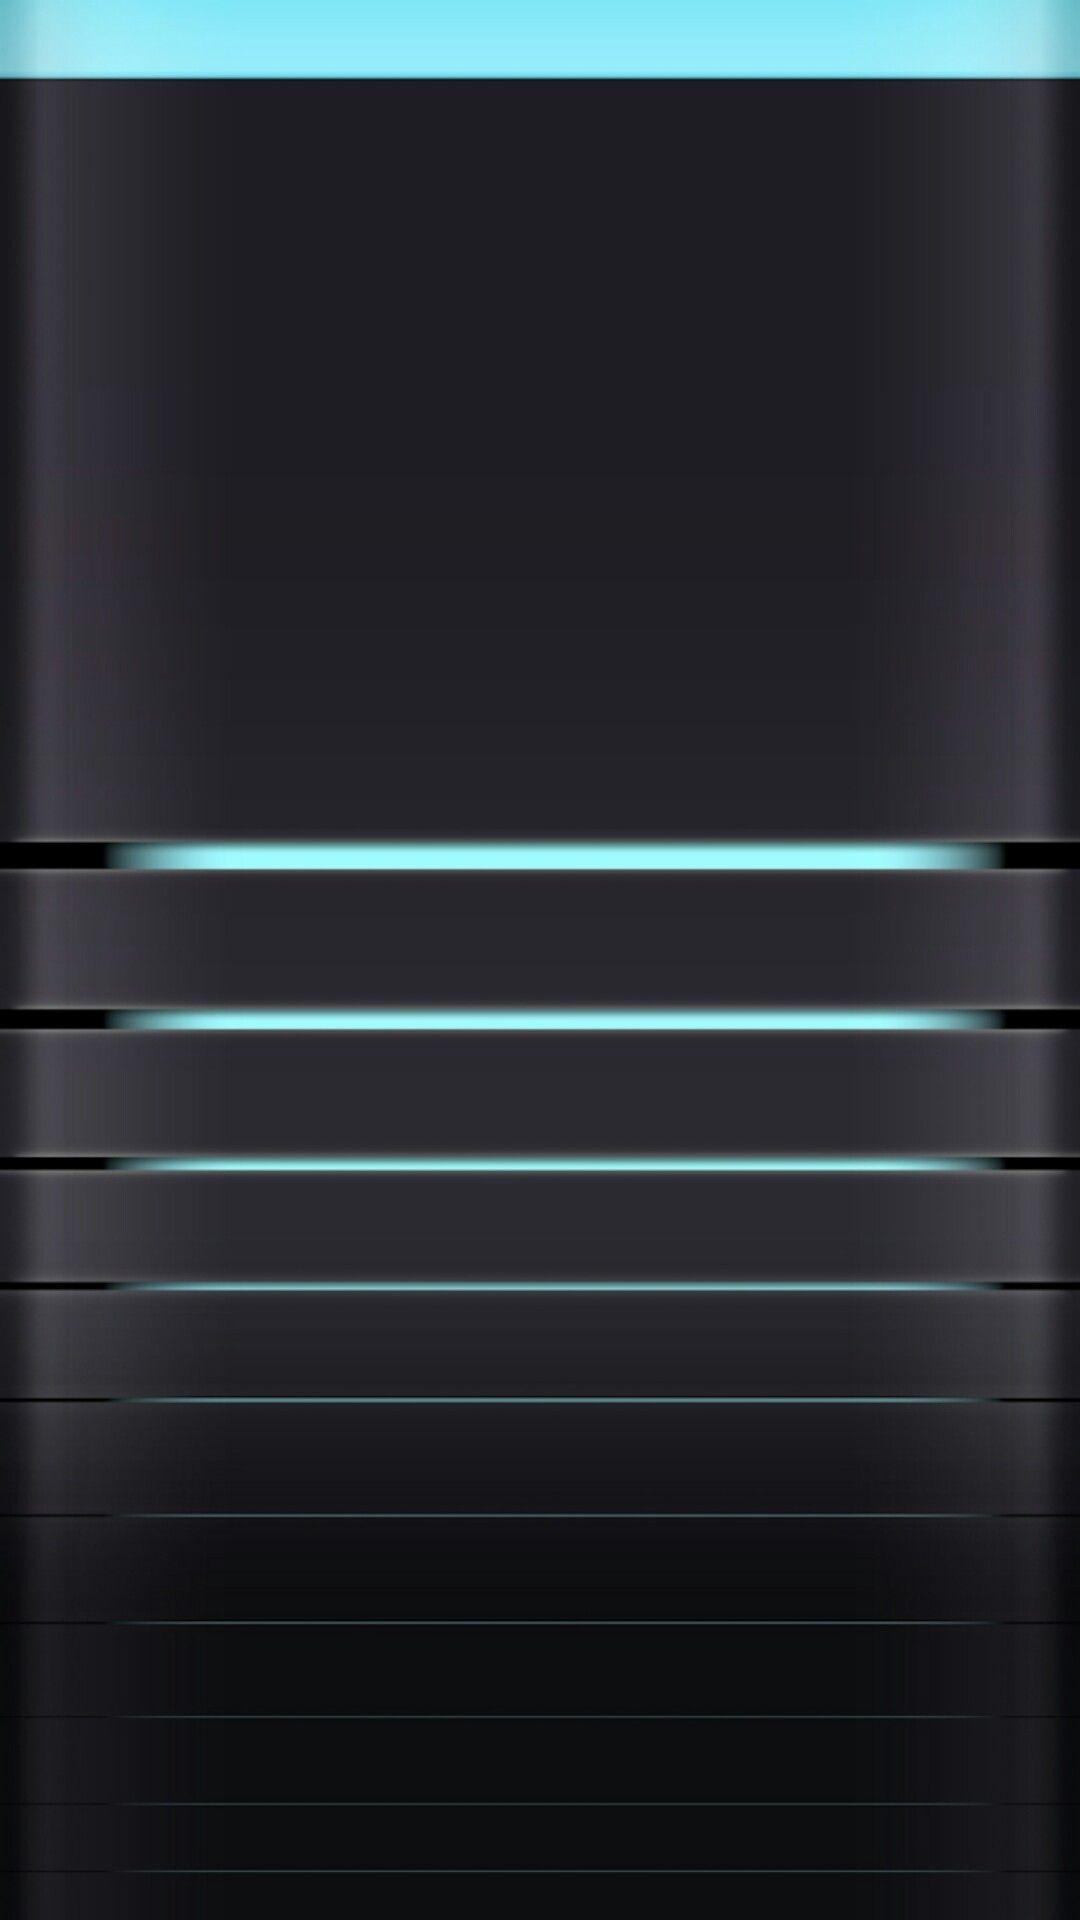 Samsung Iphone Edge Phone Telefon 3d Wallpaper Oboi Dlya Iphone Oboi Sotovyj Telefon Oboi